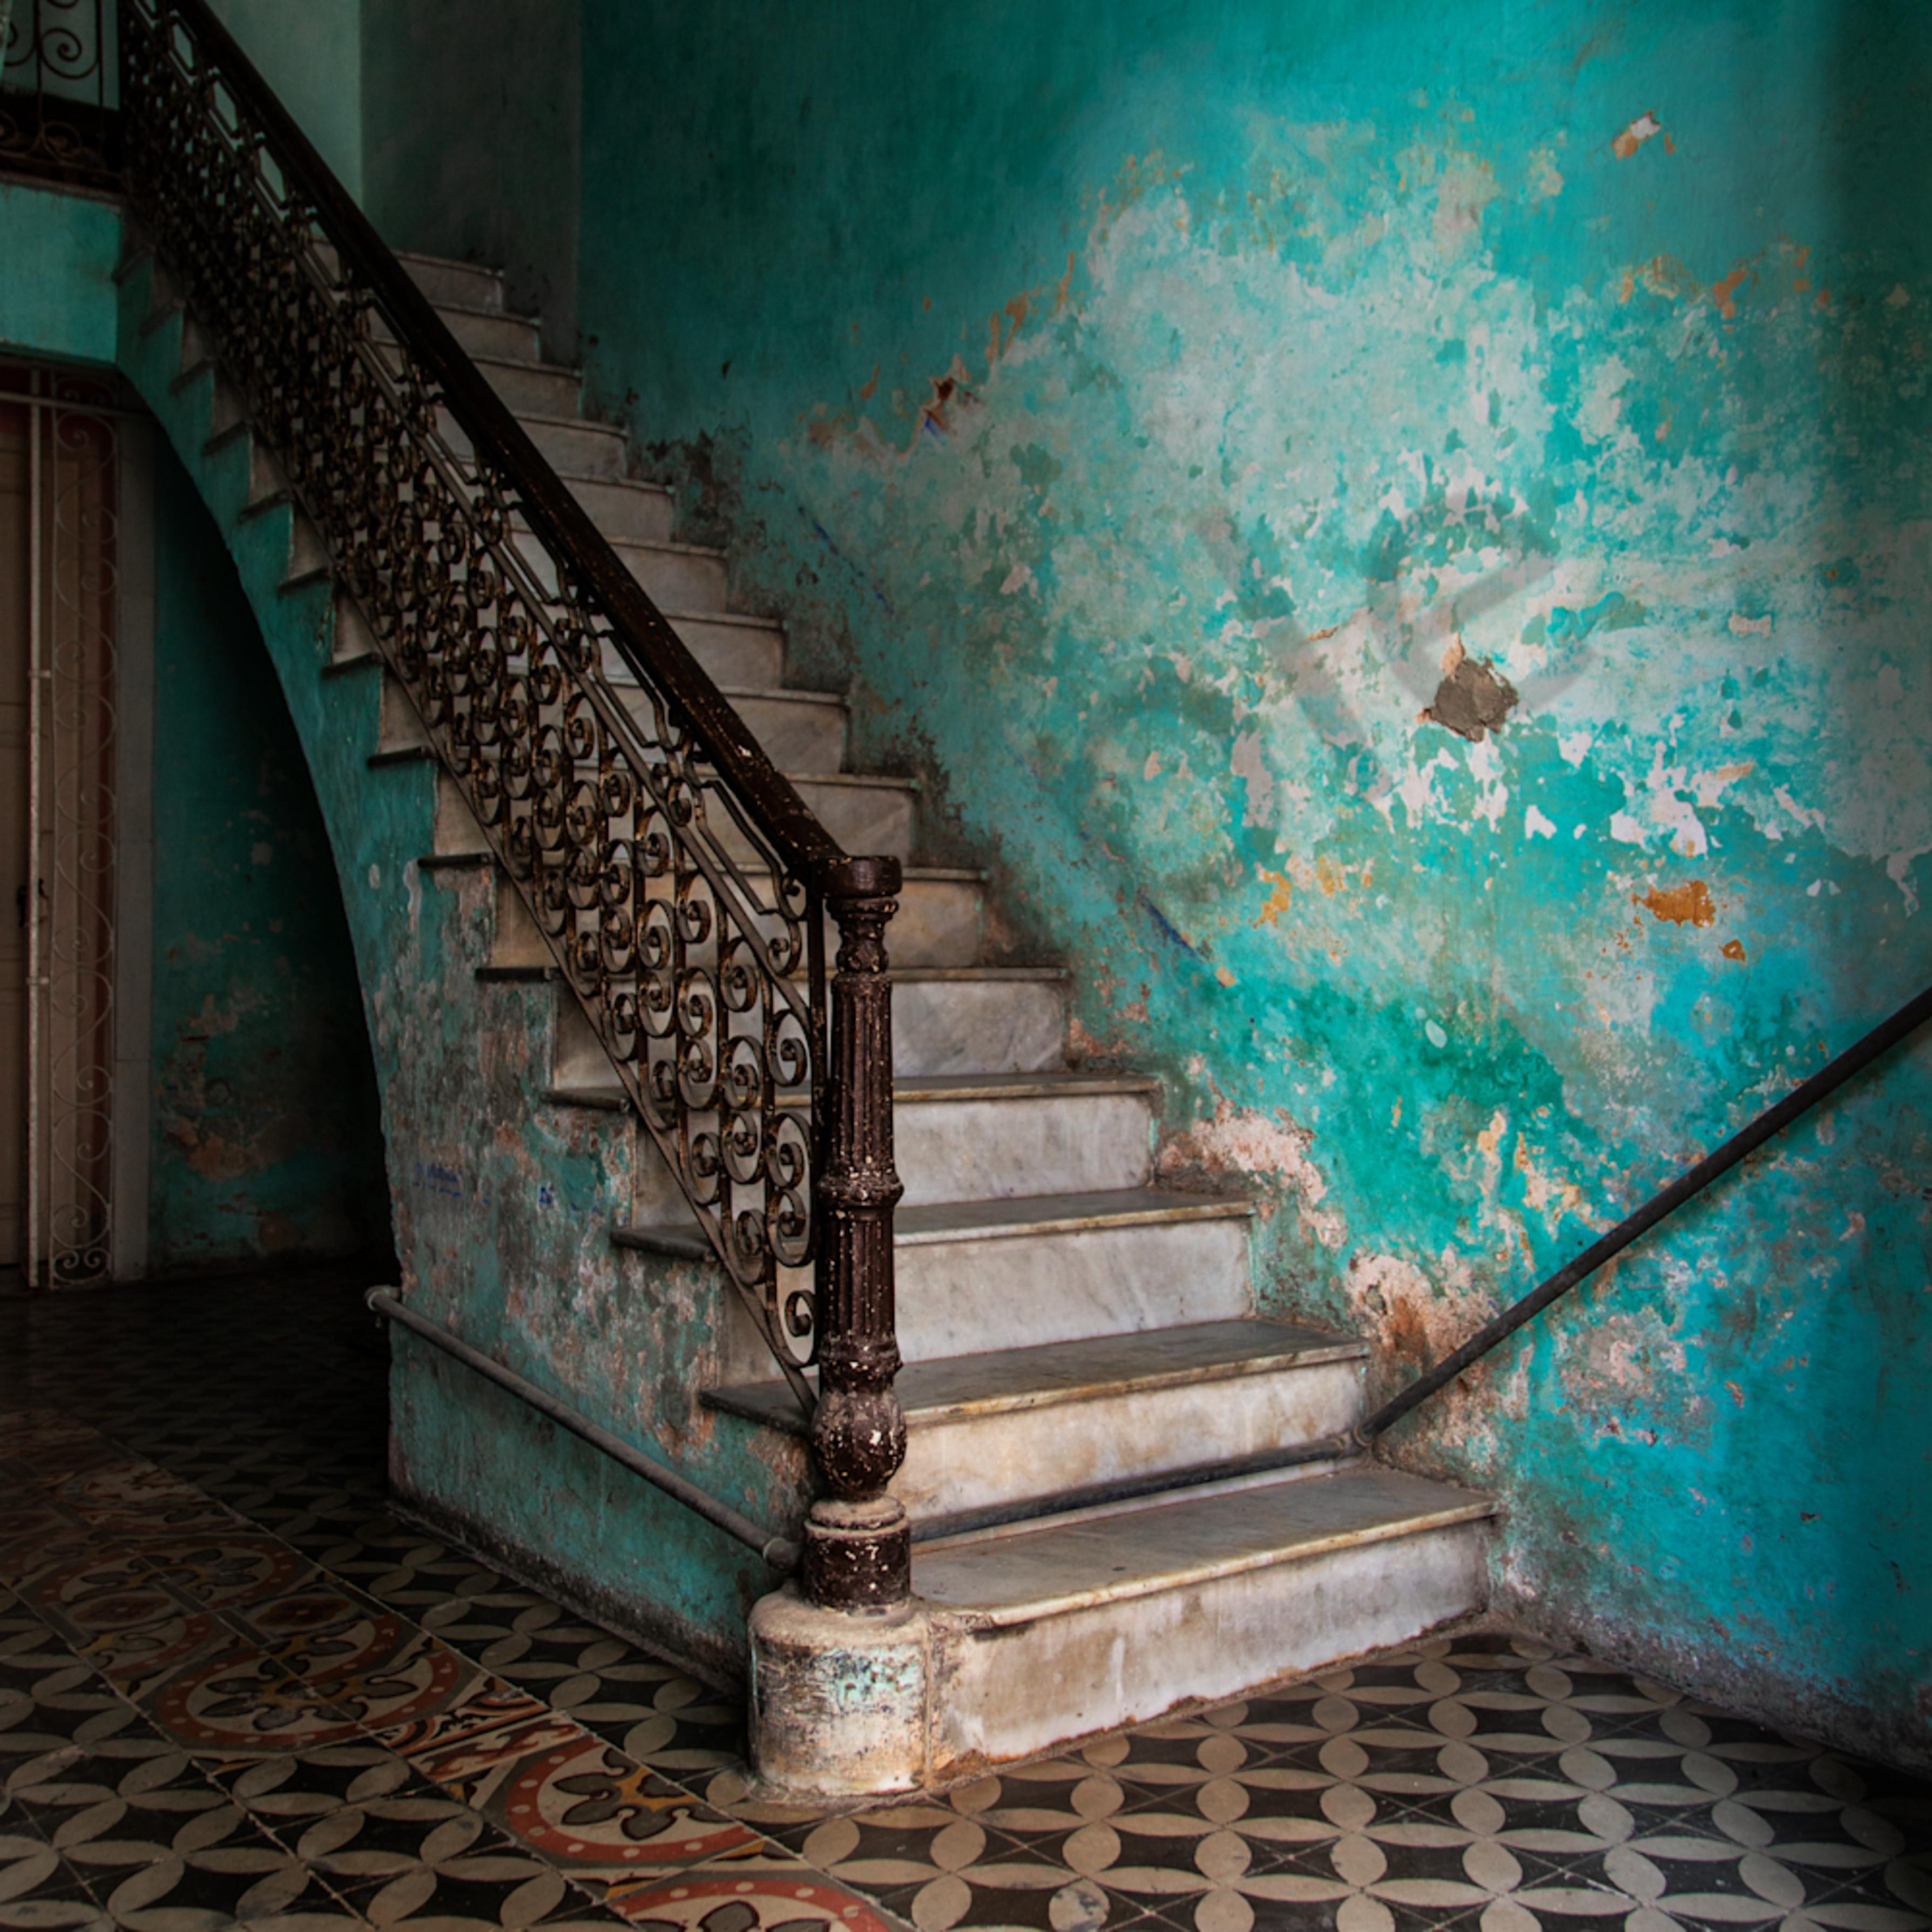 Stairs qd6aep